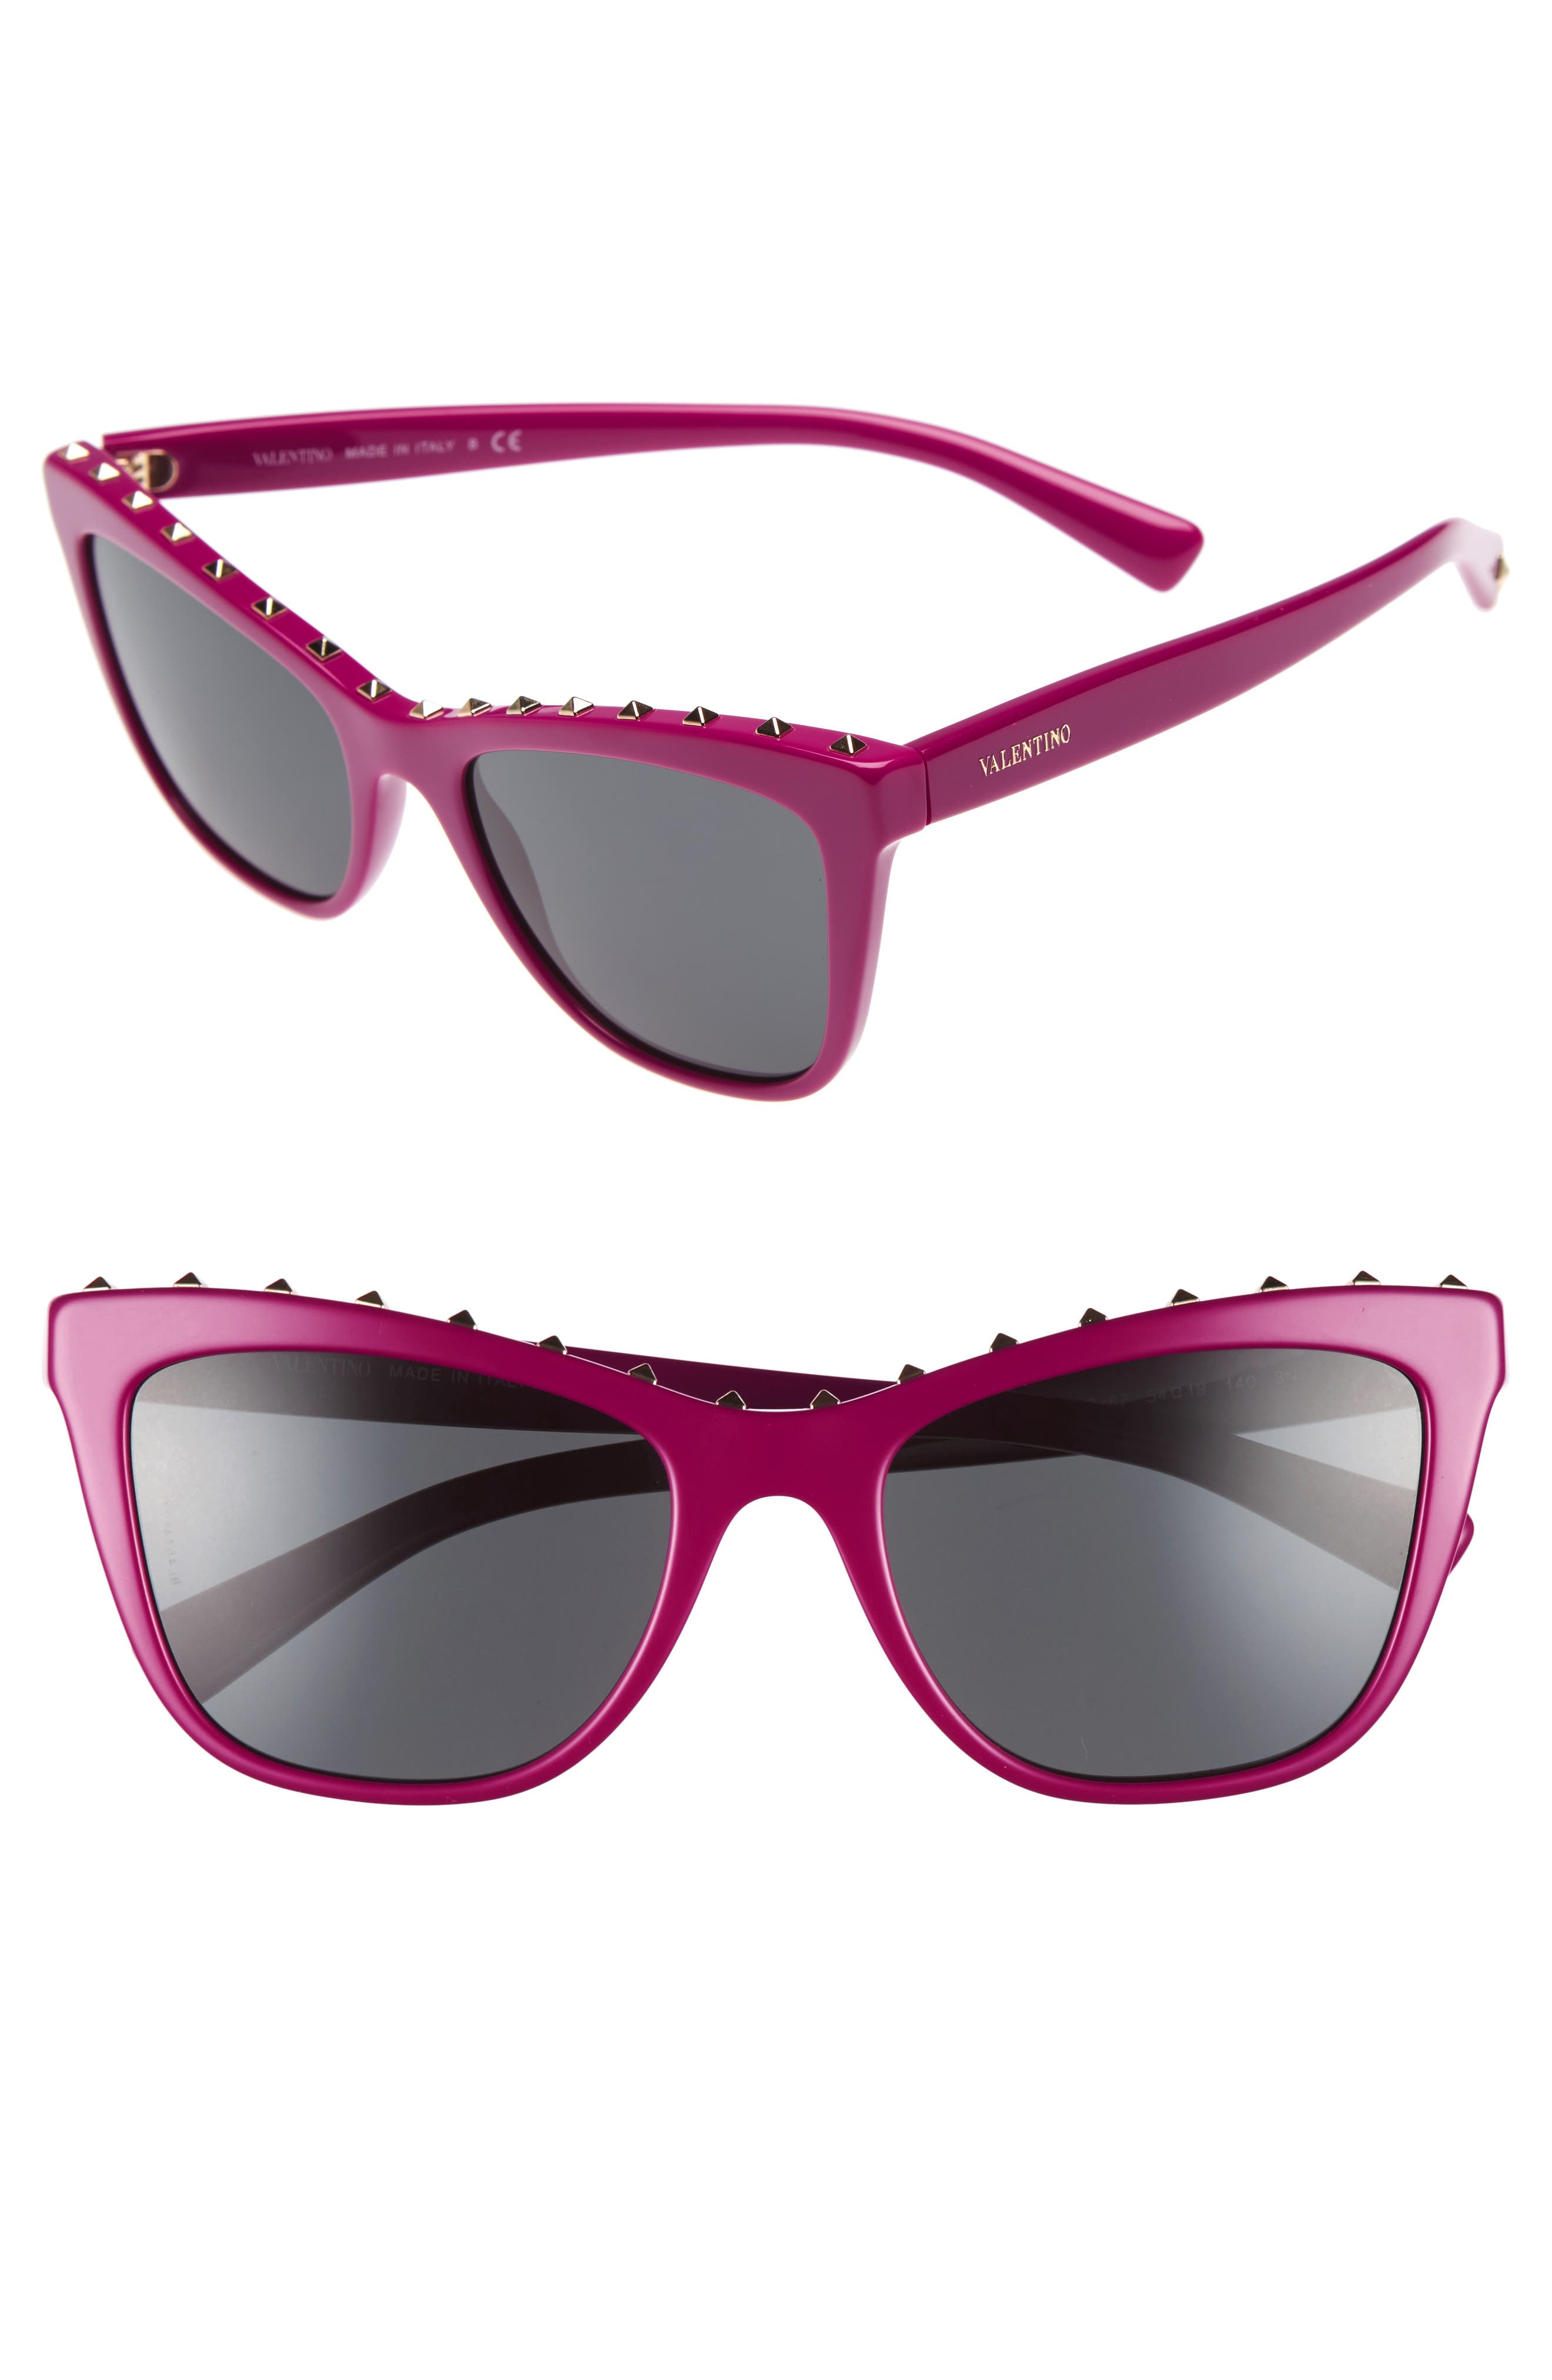 Rockstud 54mm Cat Eye Sunglasses,                             Main thumbnail 1, color,                             500